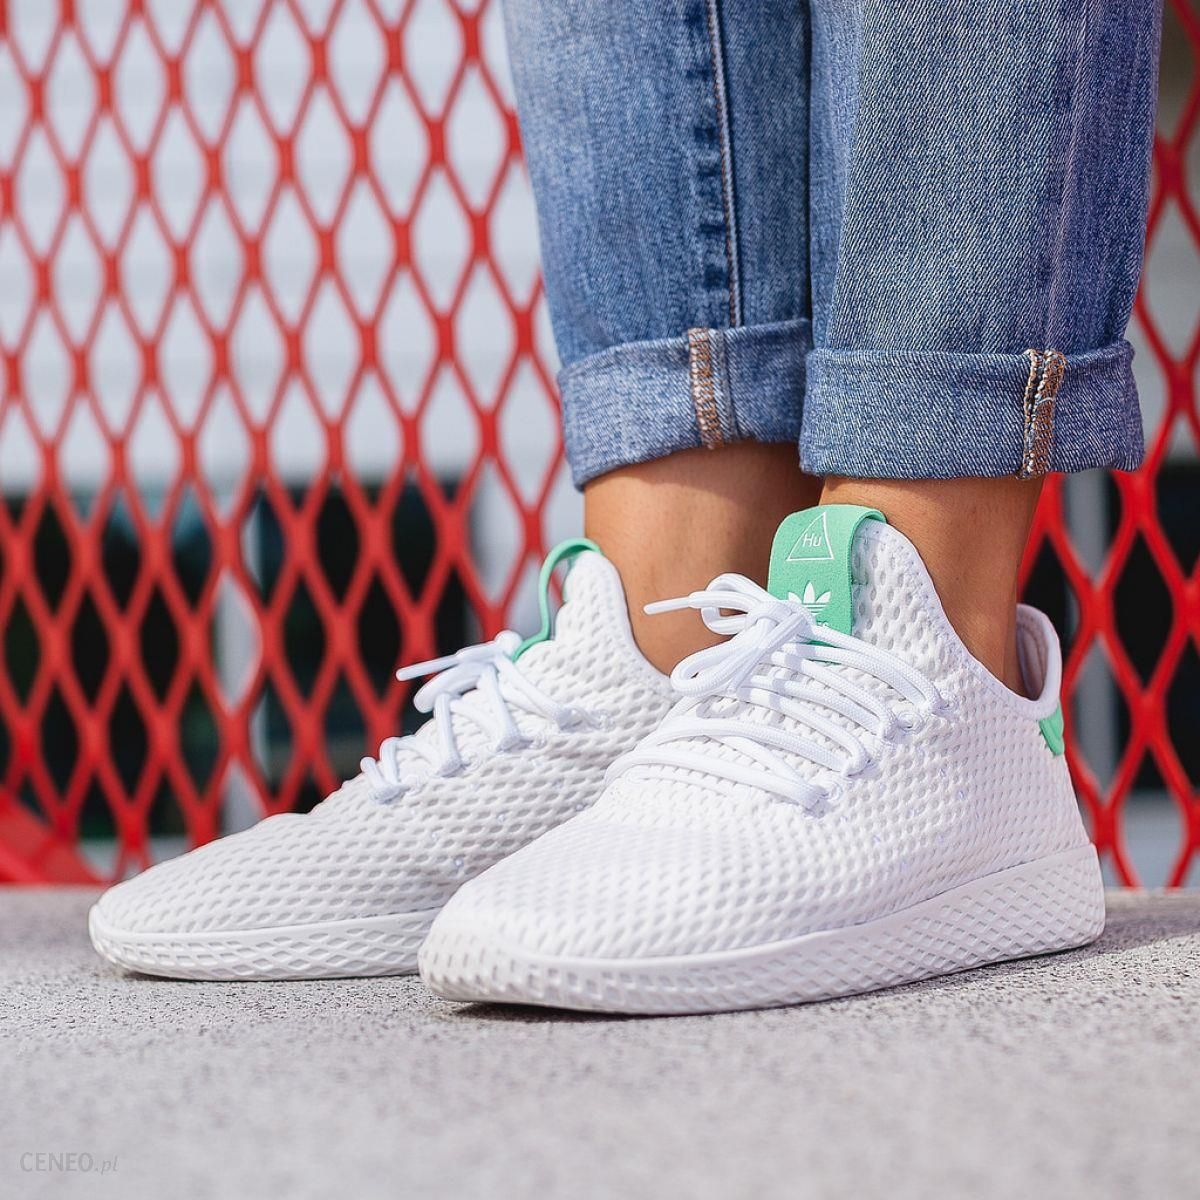 Buty m?skie sneakersy adidas Originals Pharrell Williams Tennis Hu BY8717 BIA?Y Ceny i opinie Ceneo.pl